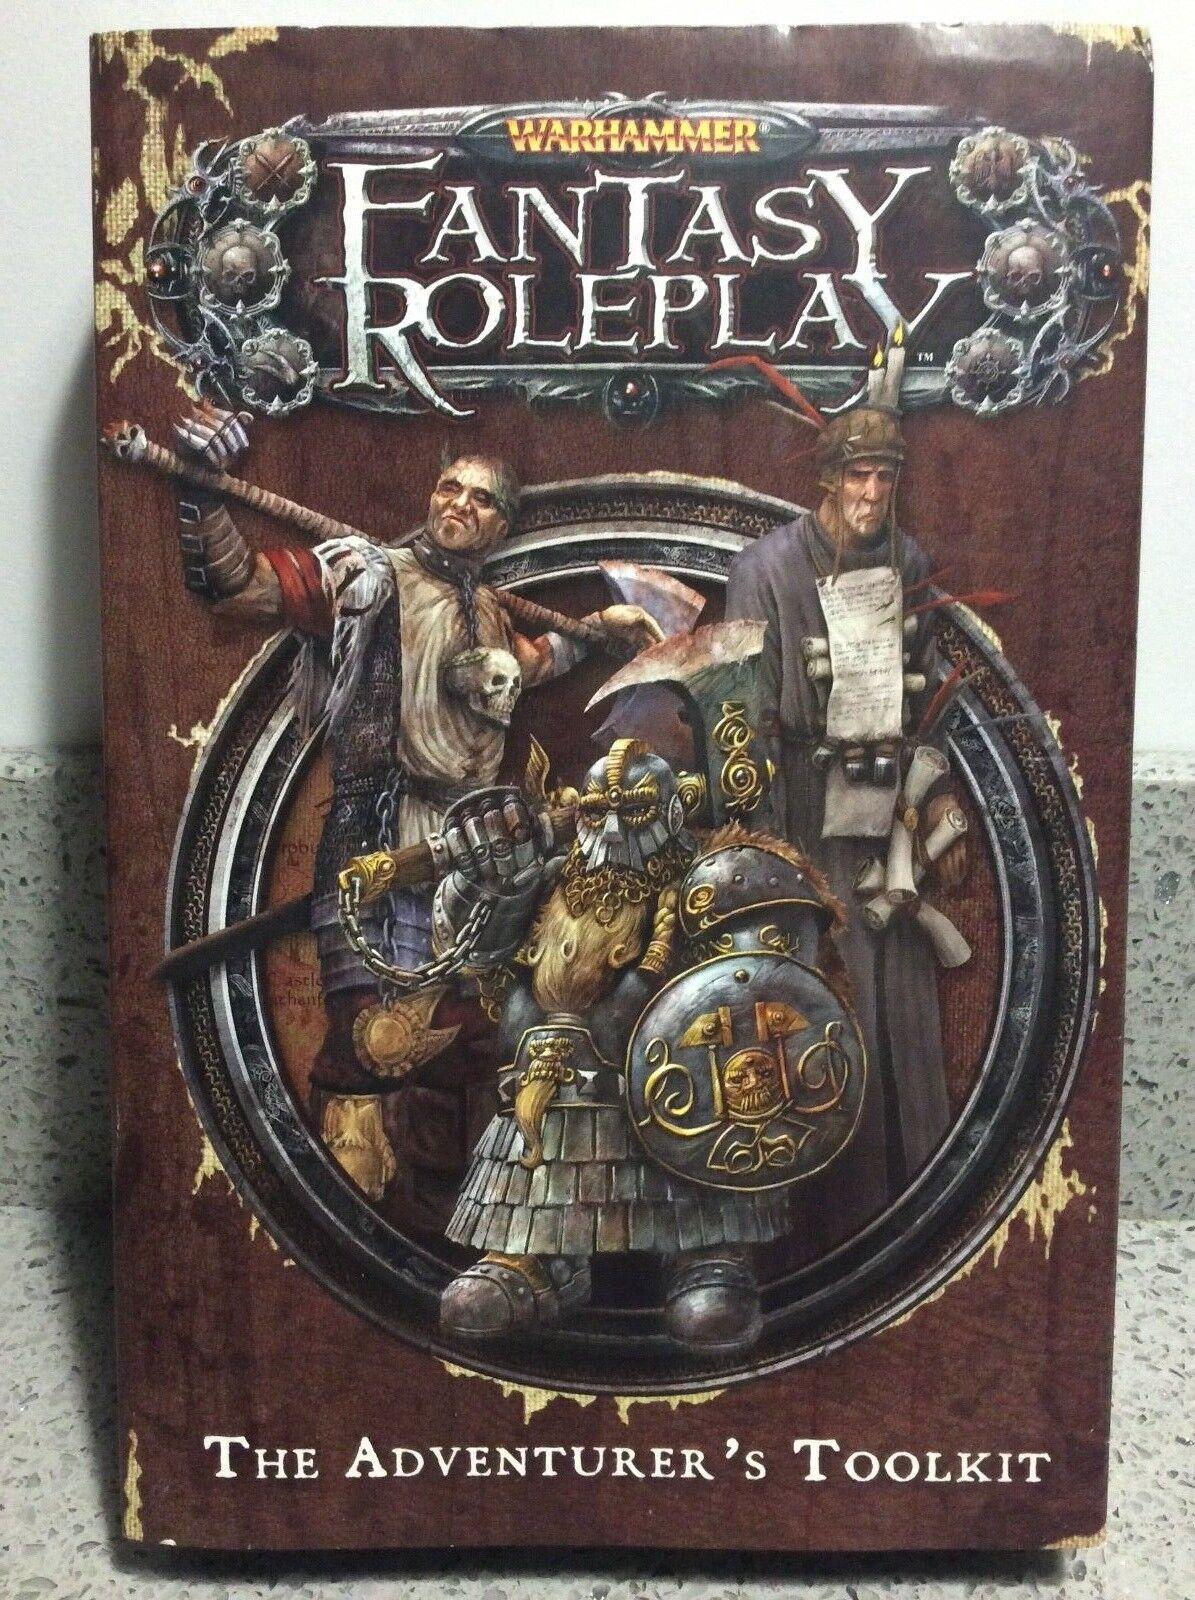 Games Workshop WARHAMMER Fantasy Roleplay THE ADVENTURER'S TOOLKIT - New Sealed